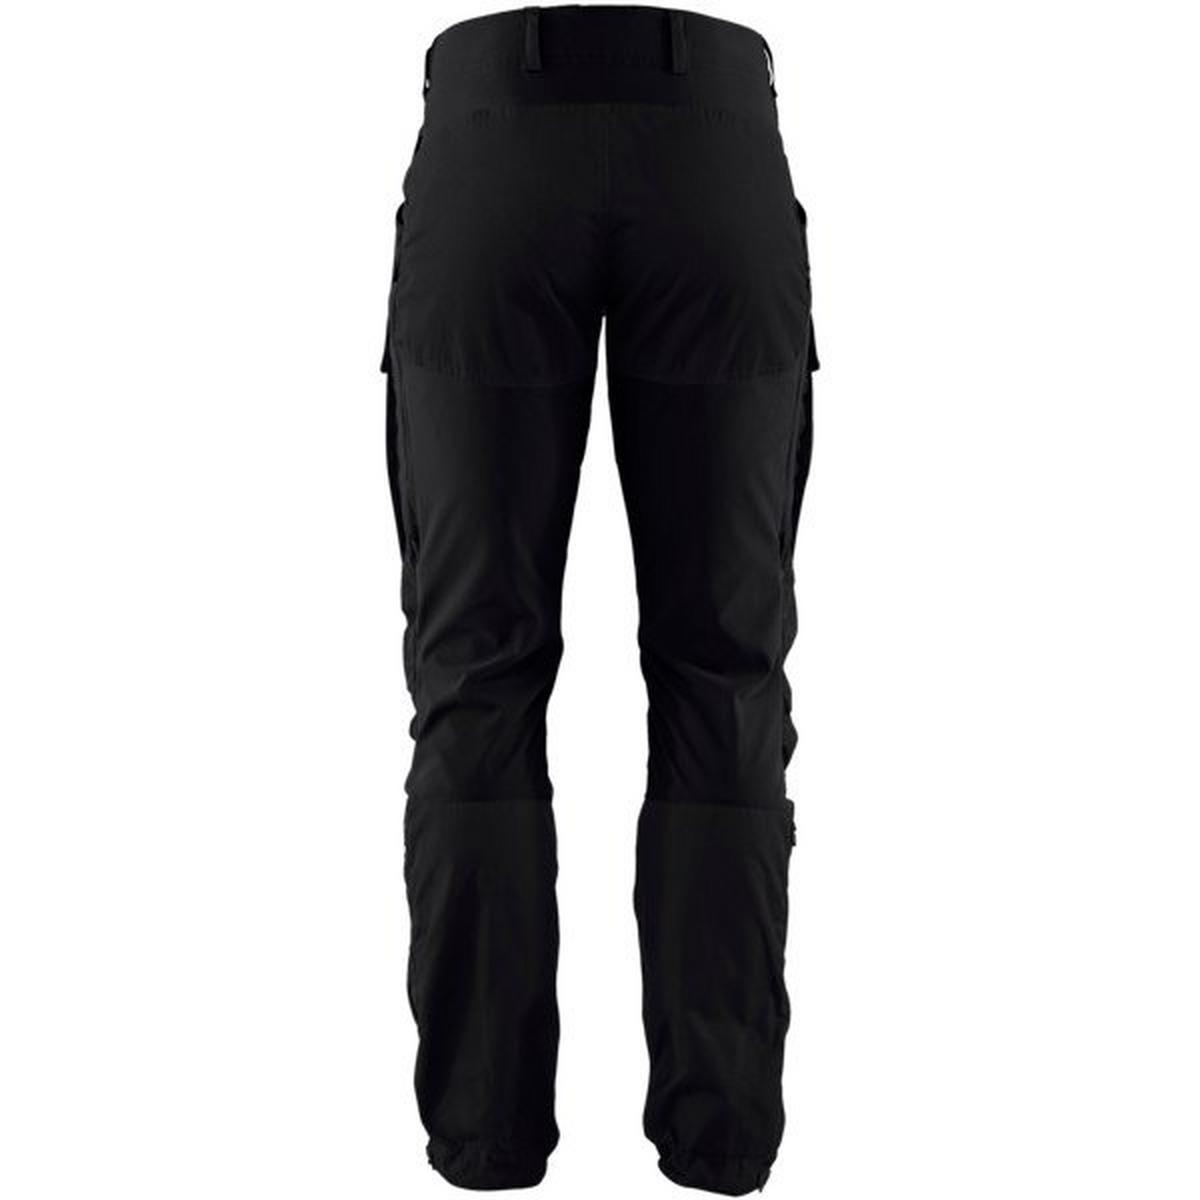 Fjallraven Men's Fjallraven Keb Trousers Regular - Black